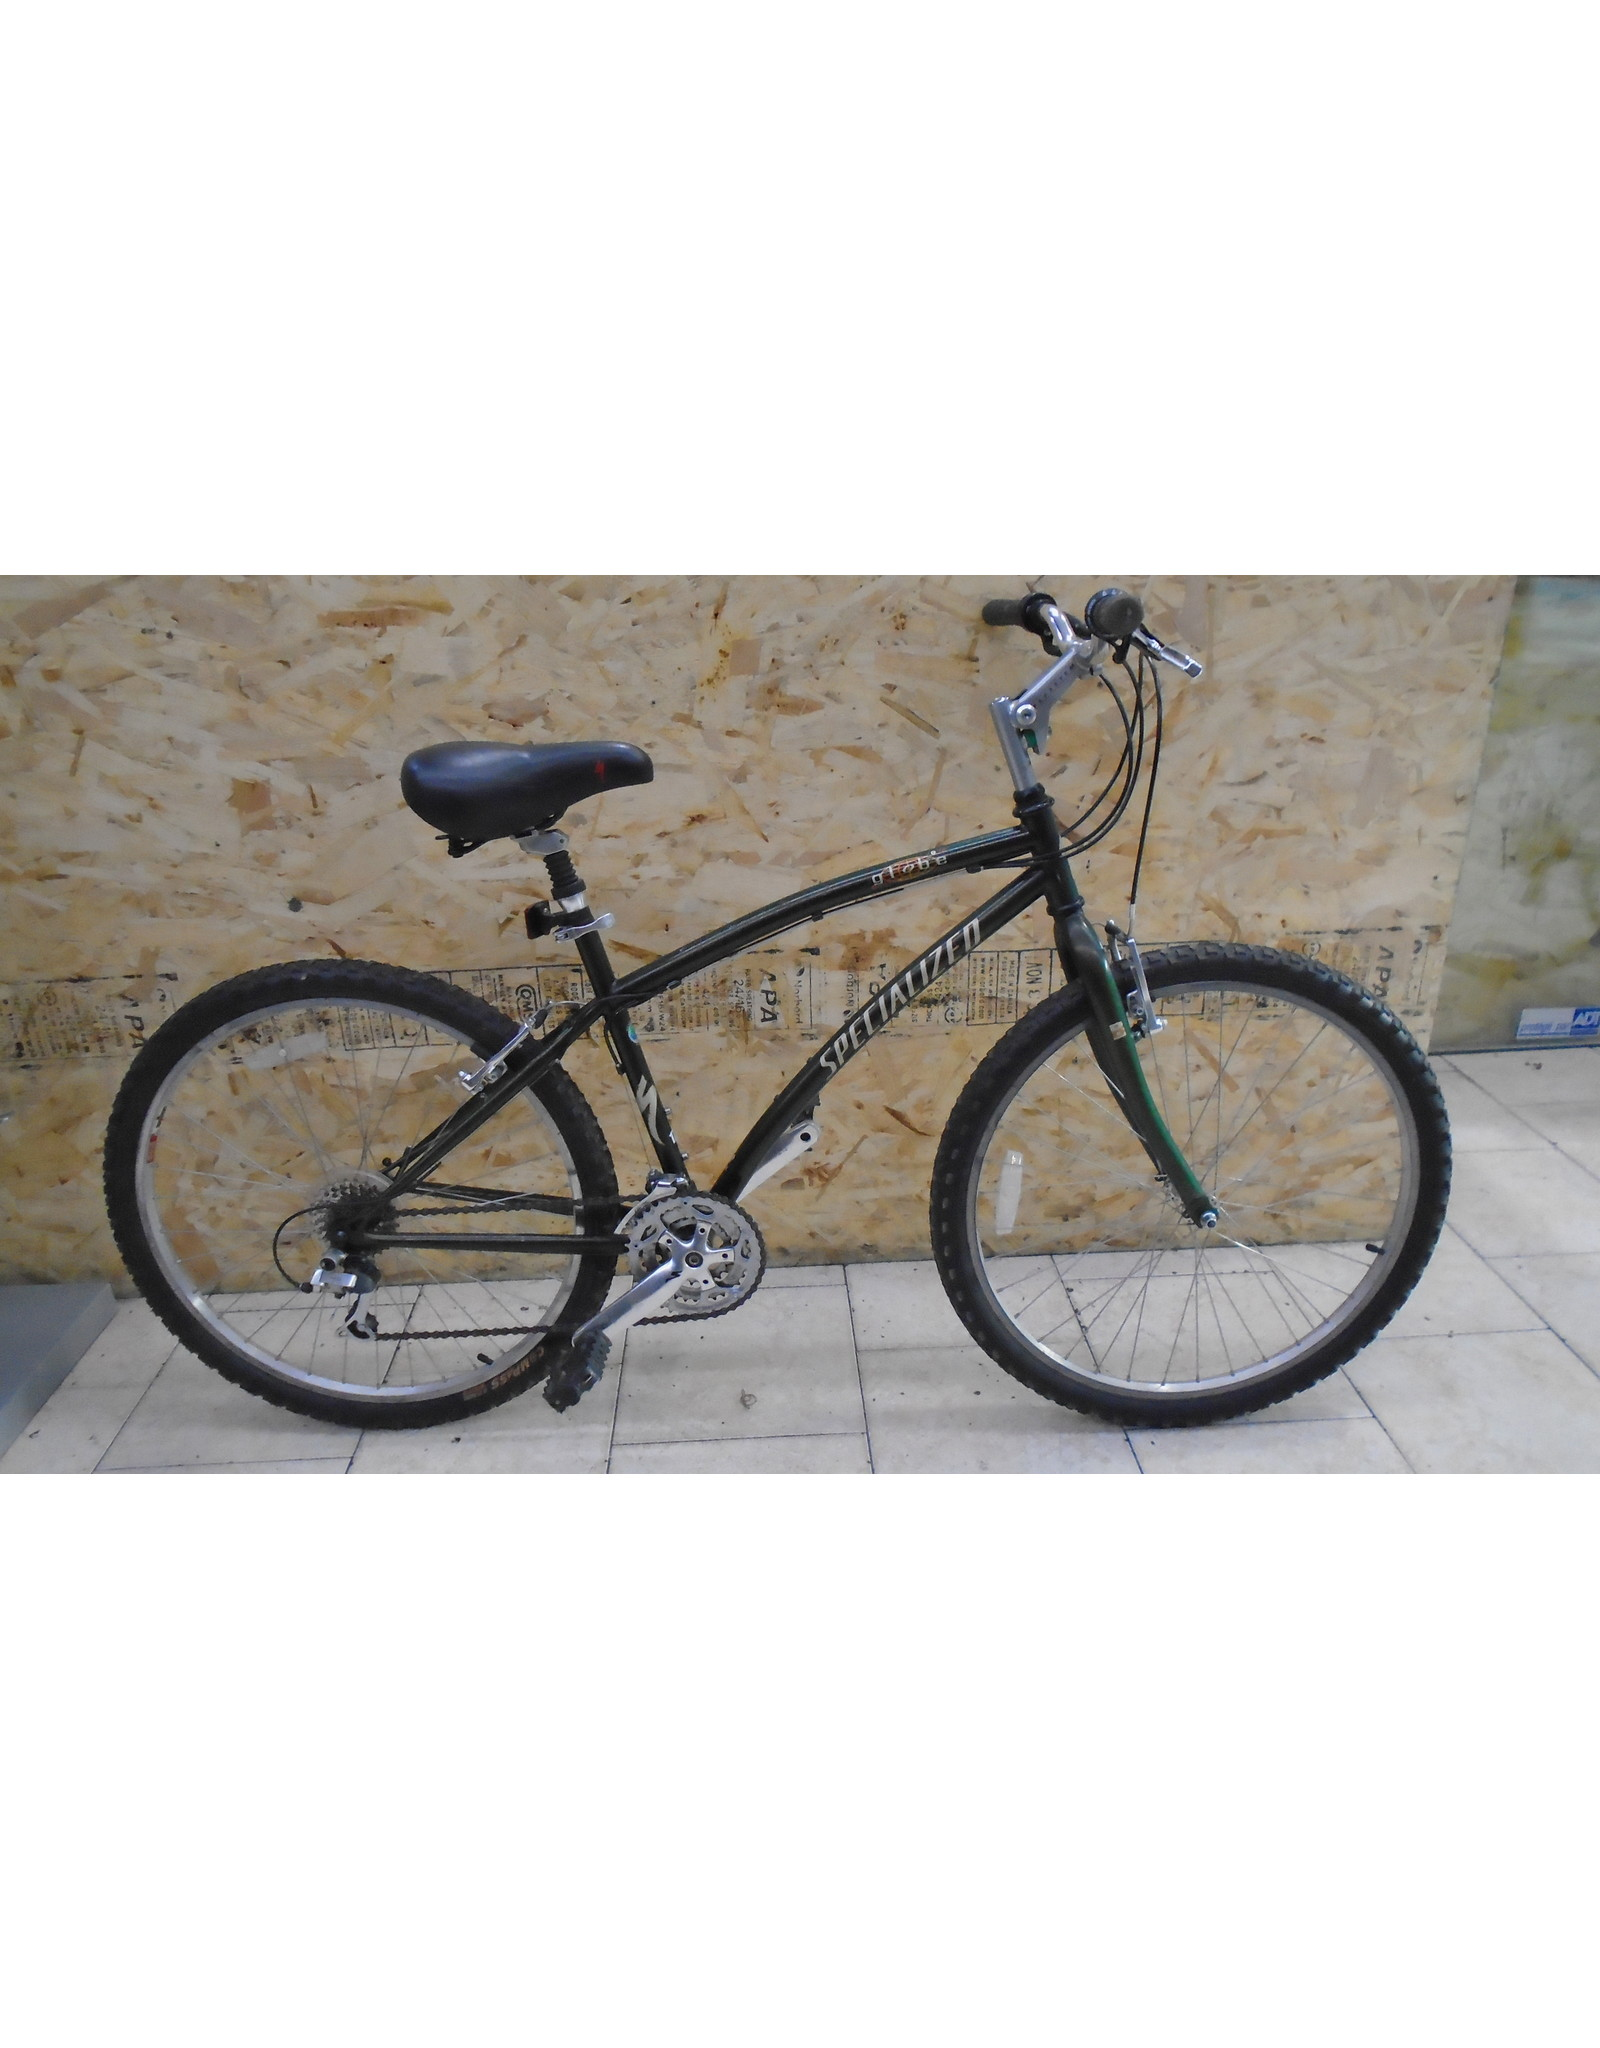 "Vélo usagé de montagne Specialized 17"" - 10308"